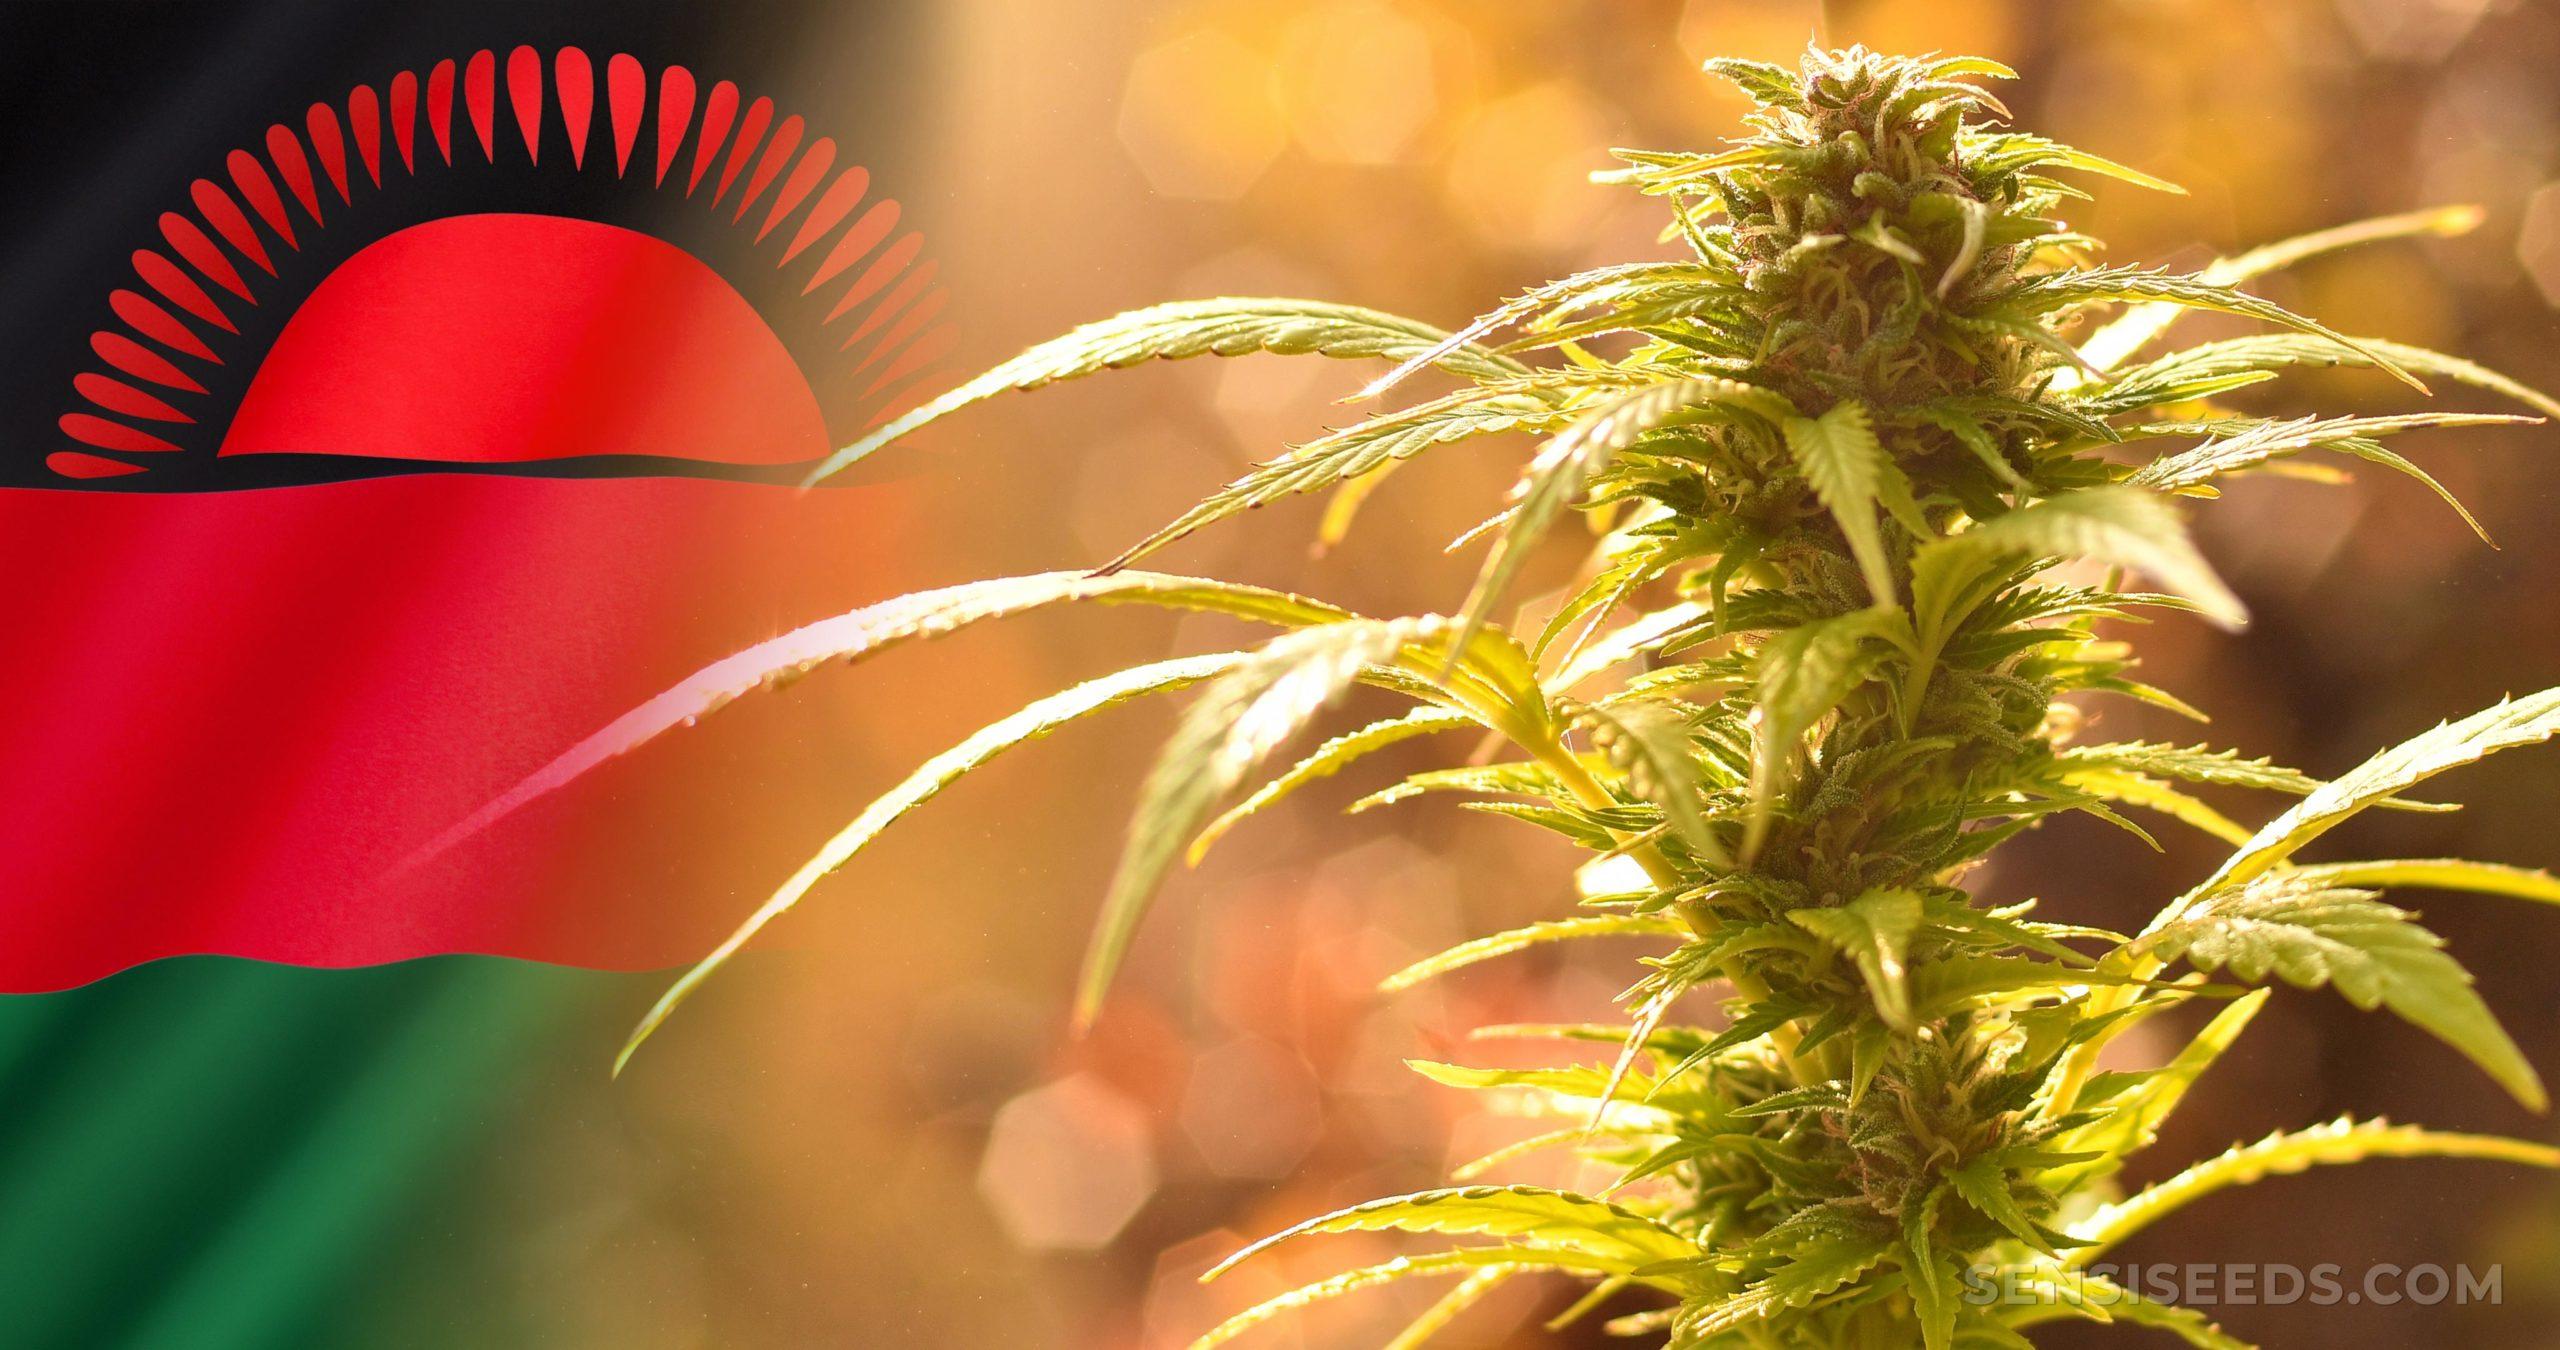 The Malawi flag and a cannabis plant